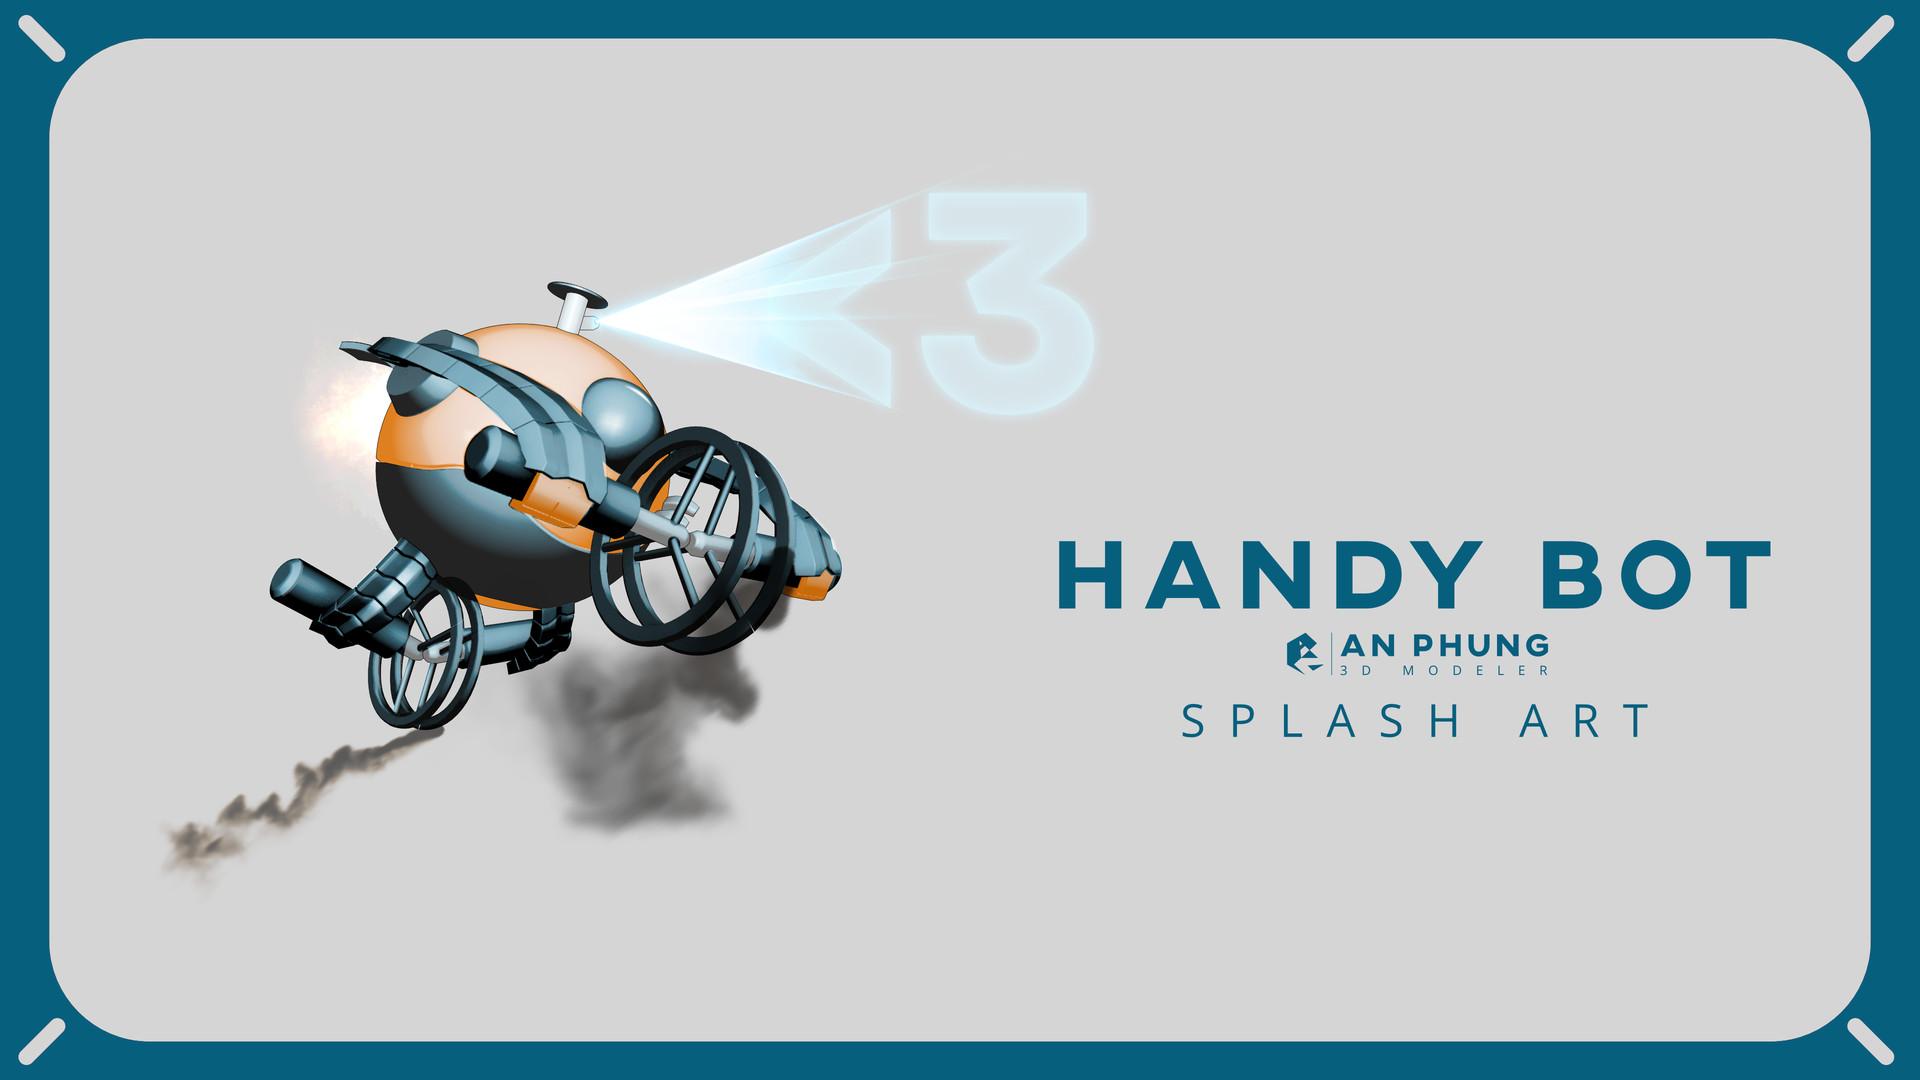 An phung phung handybot splashart